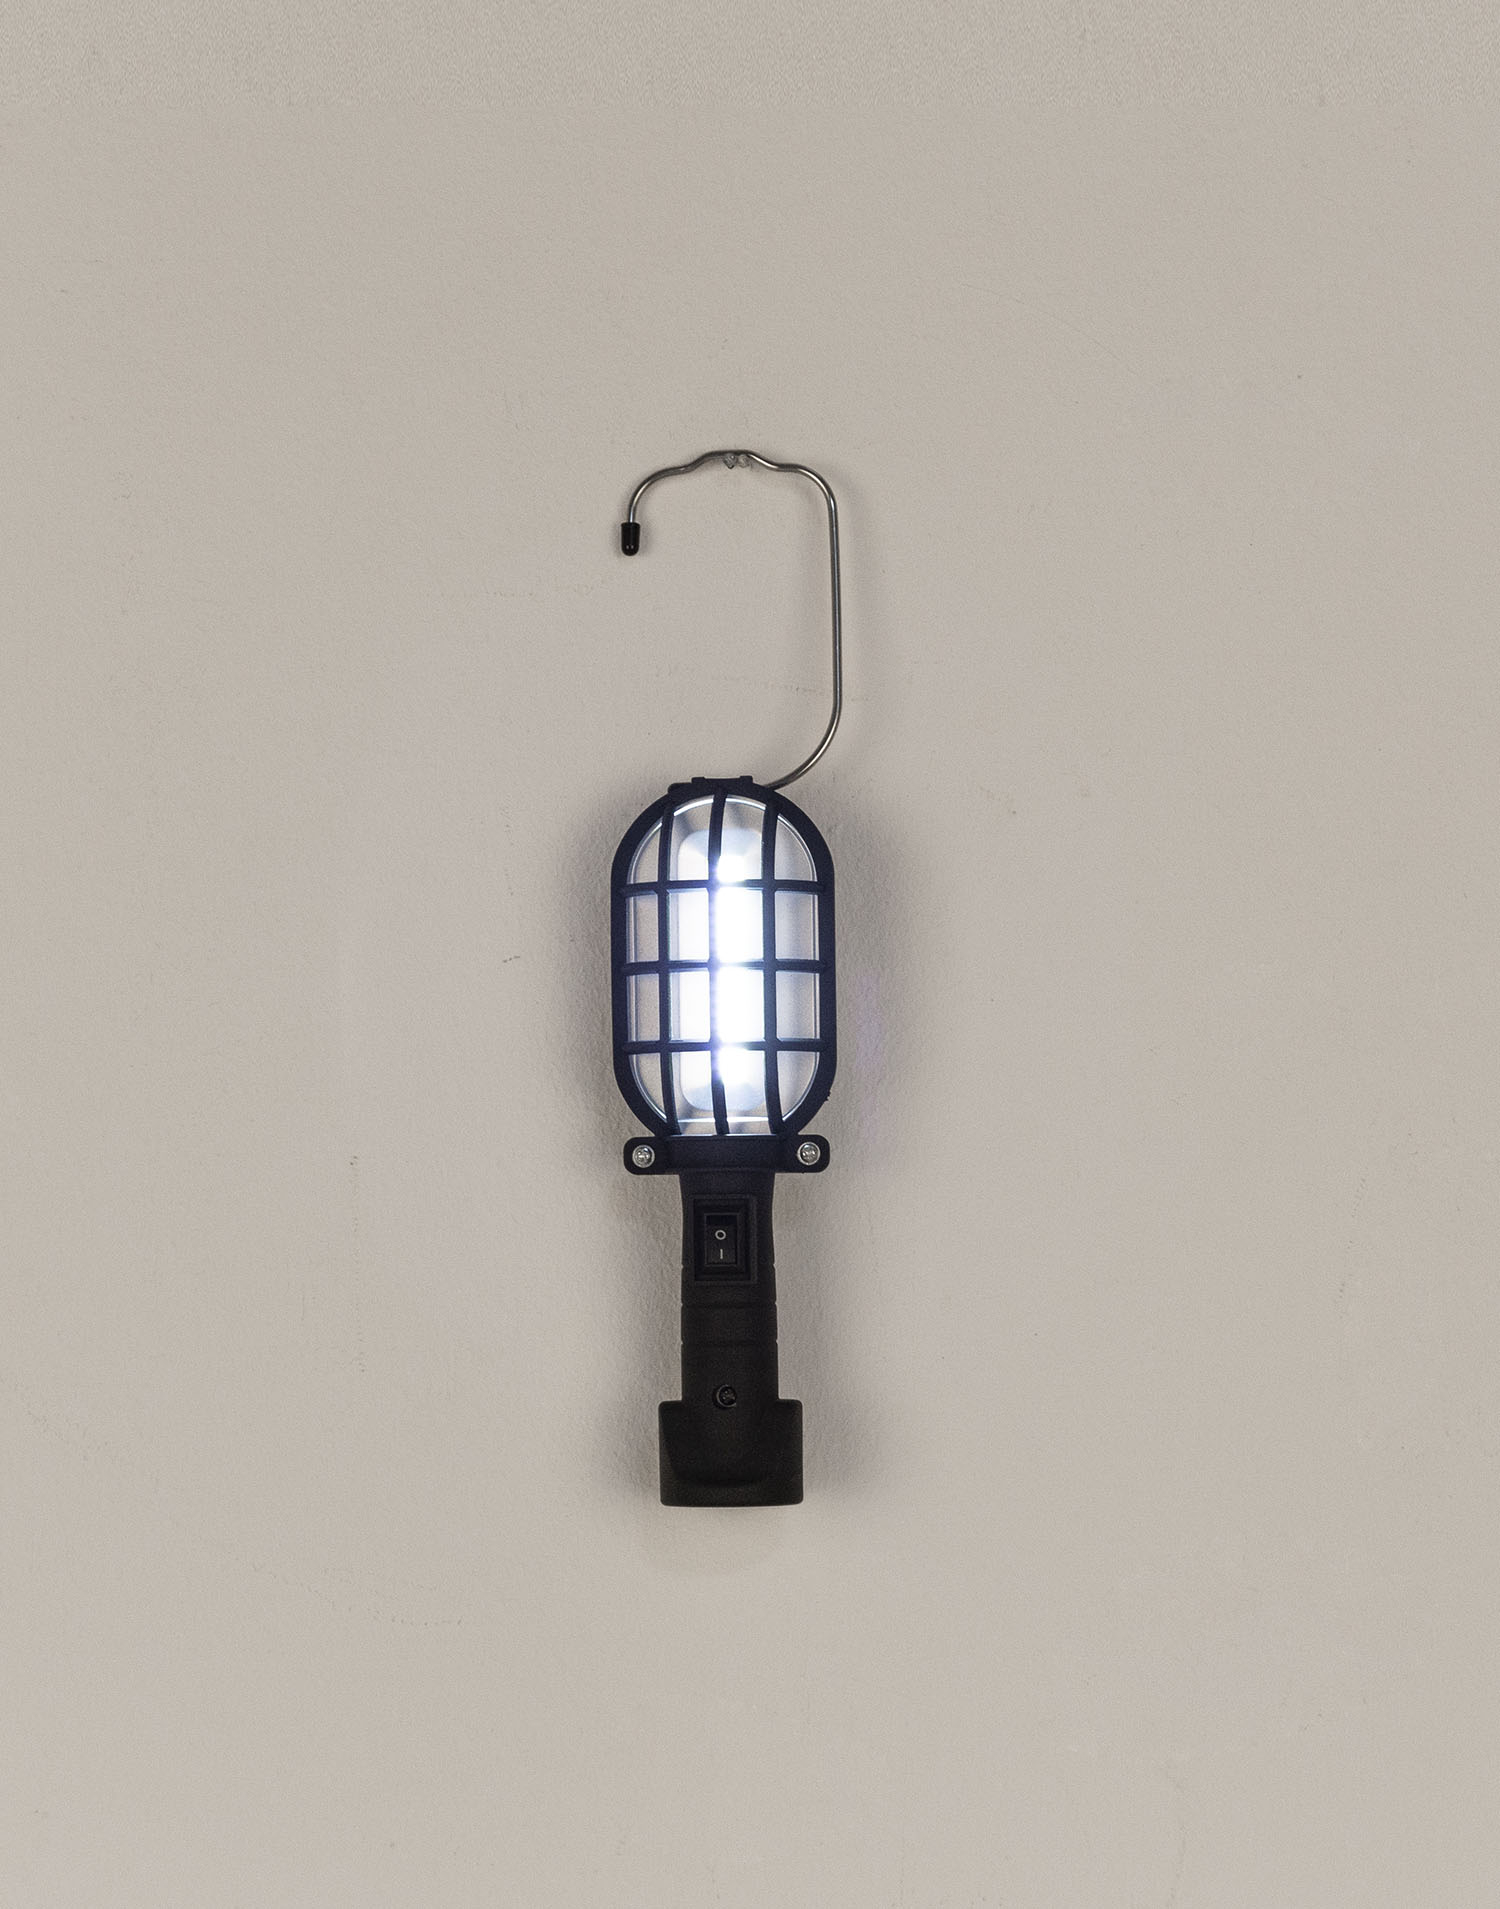 Multipurpose light